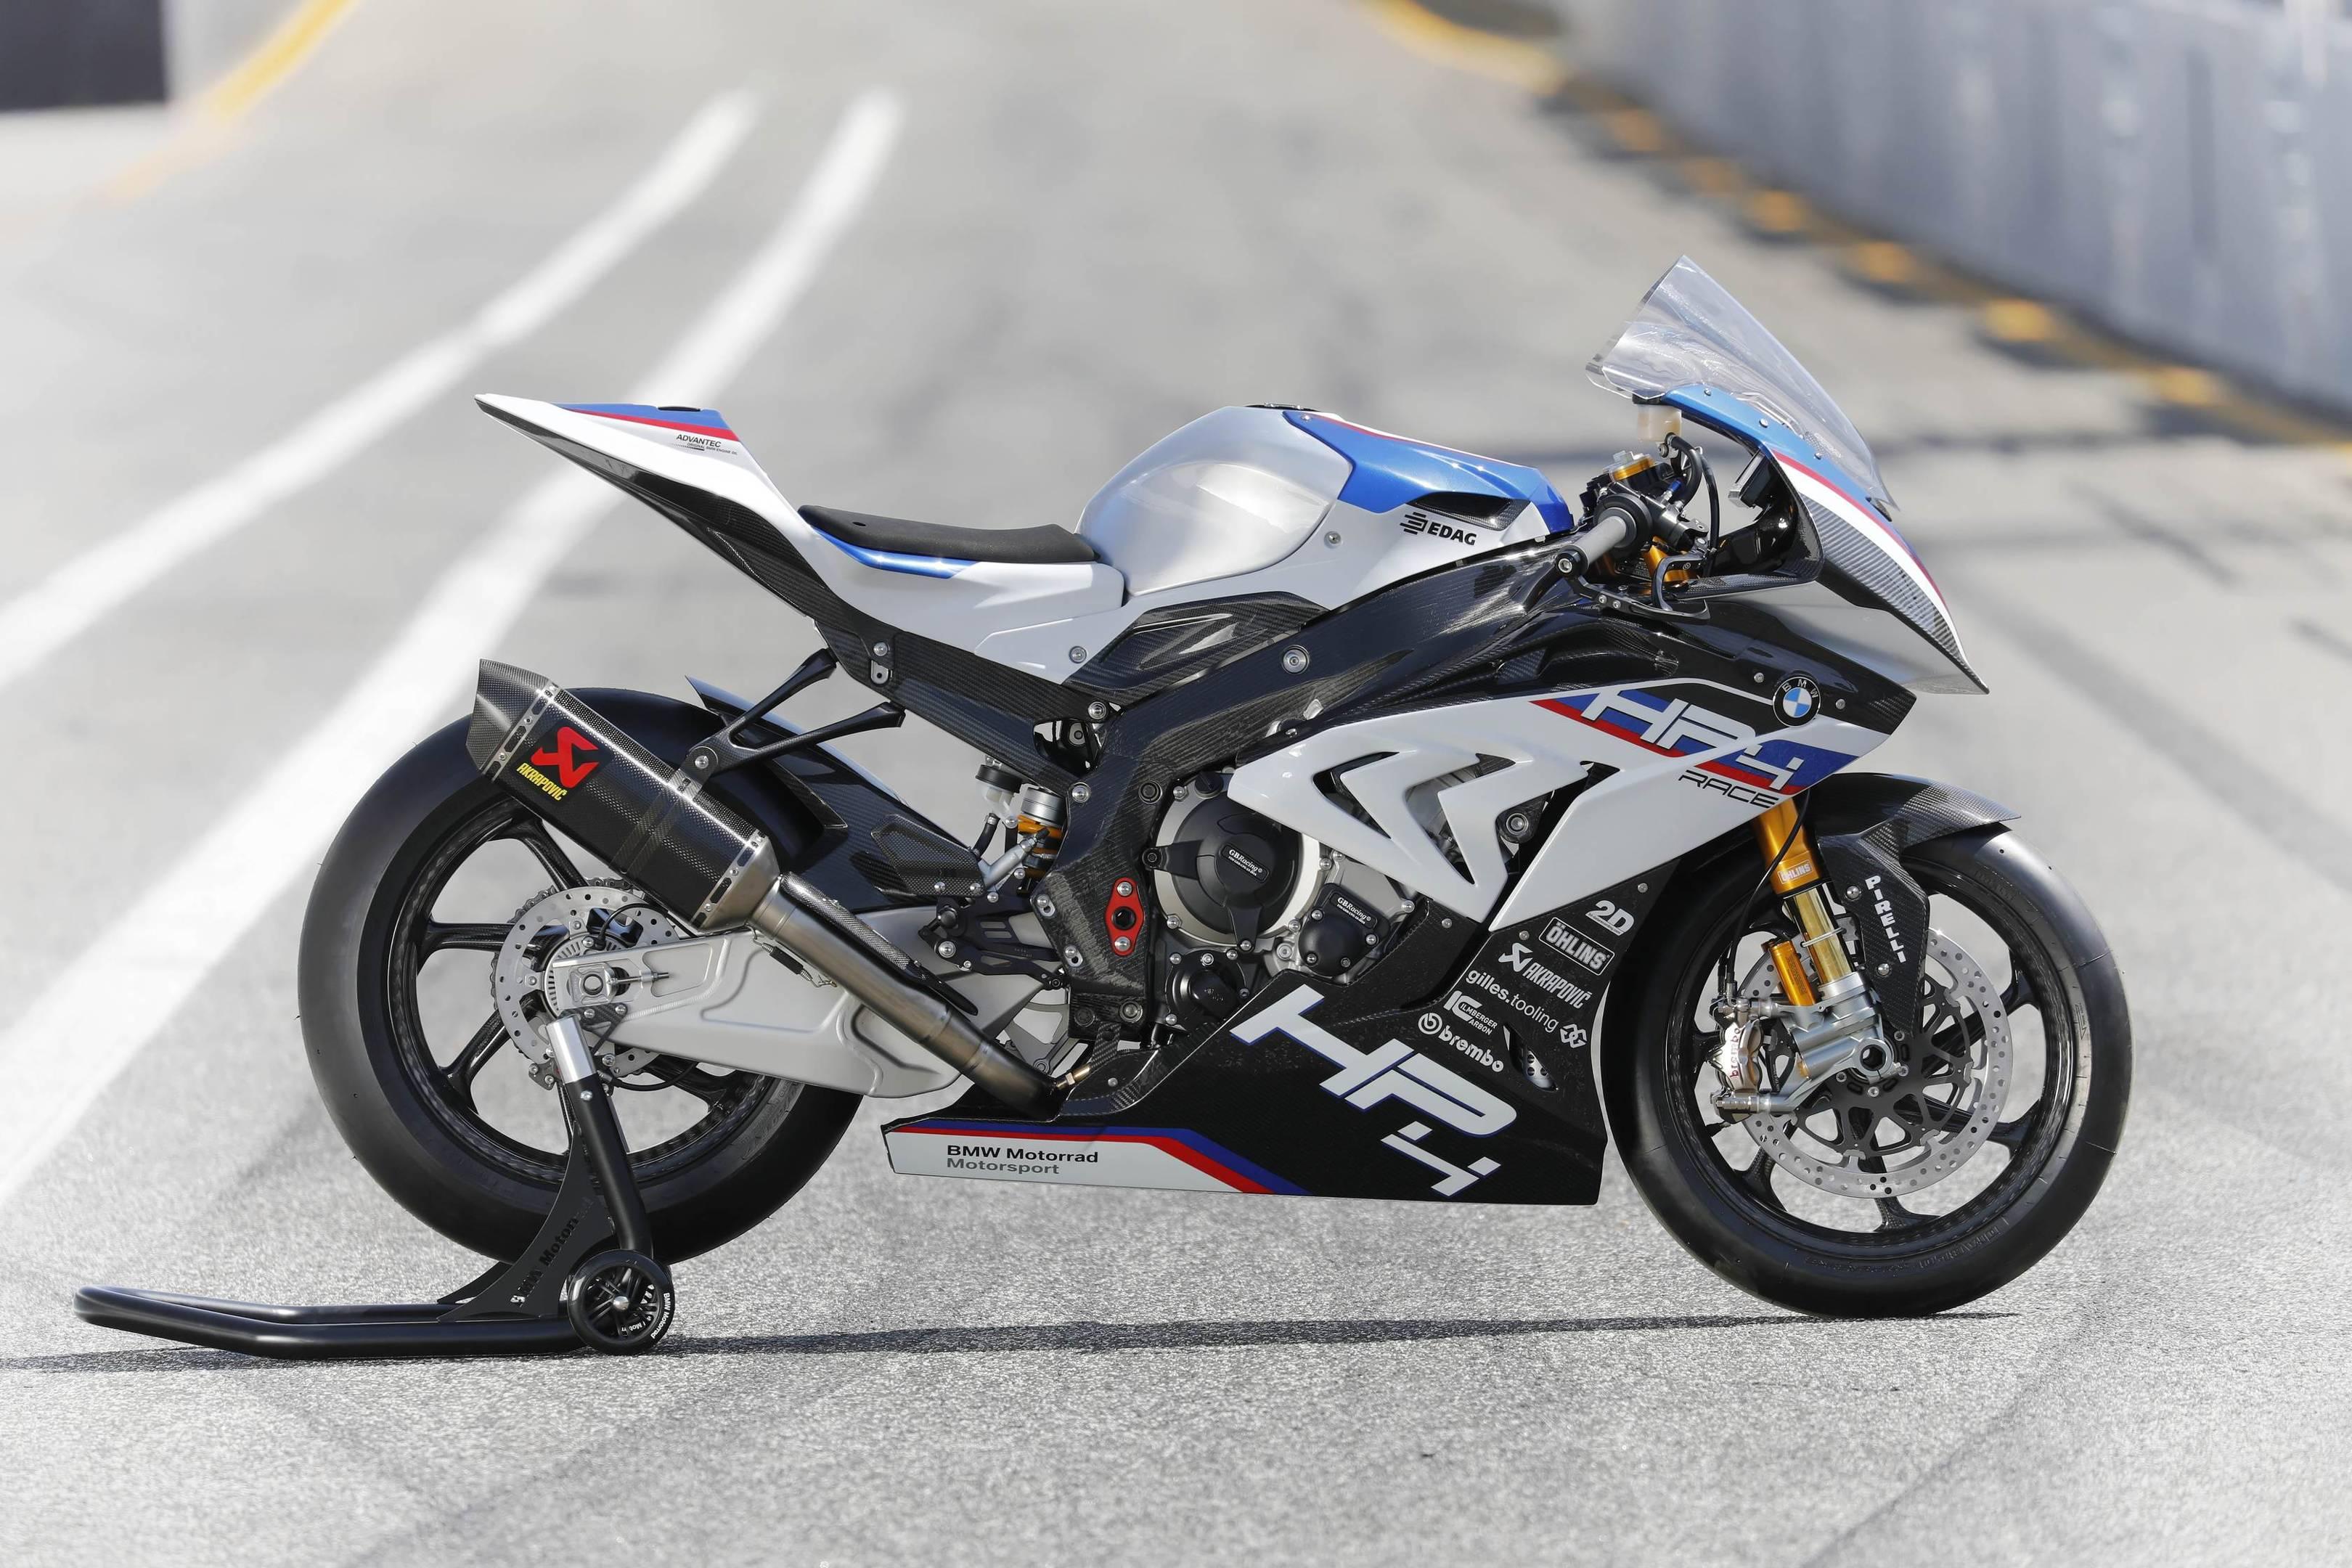 Bmw Hp4 Race The Ultimate Superbike British Gq